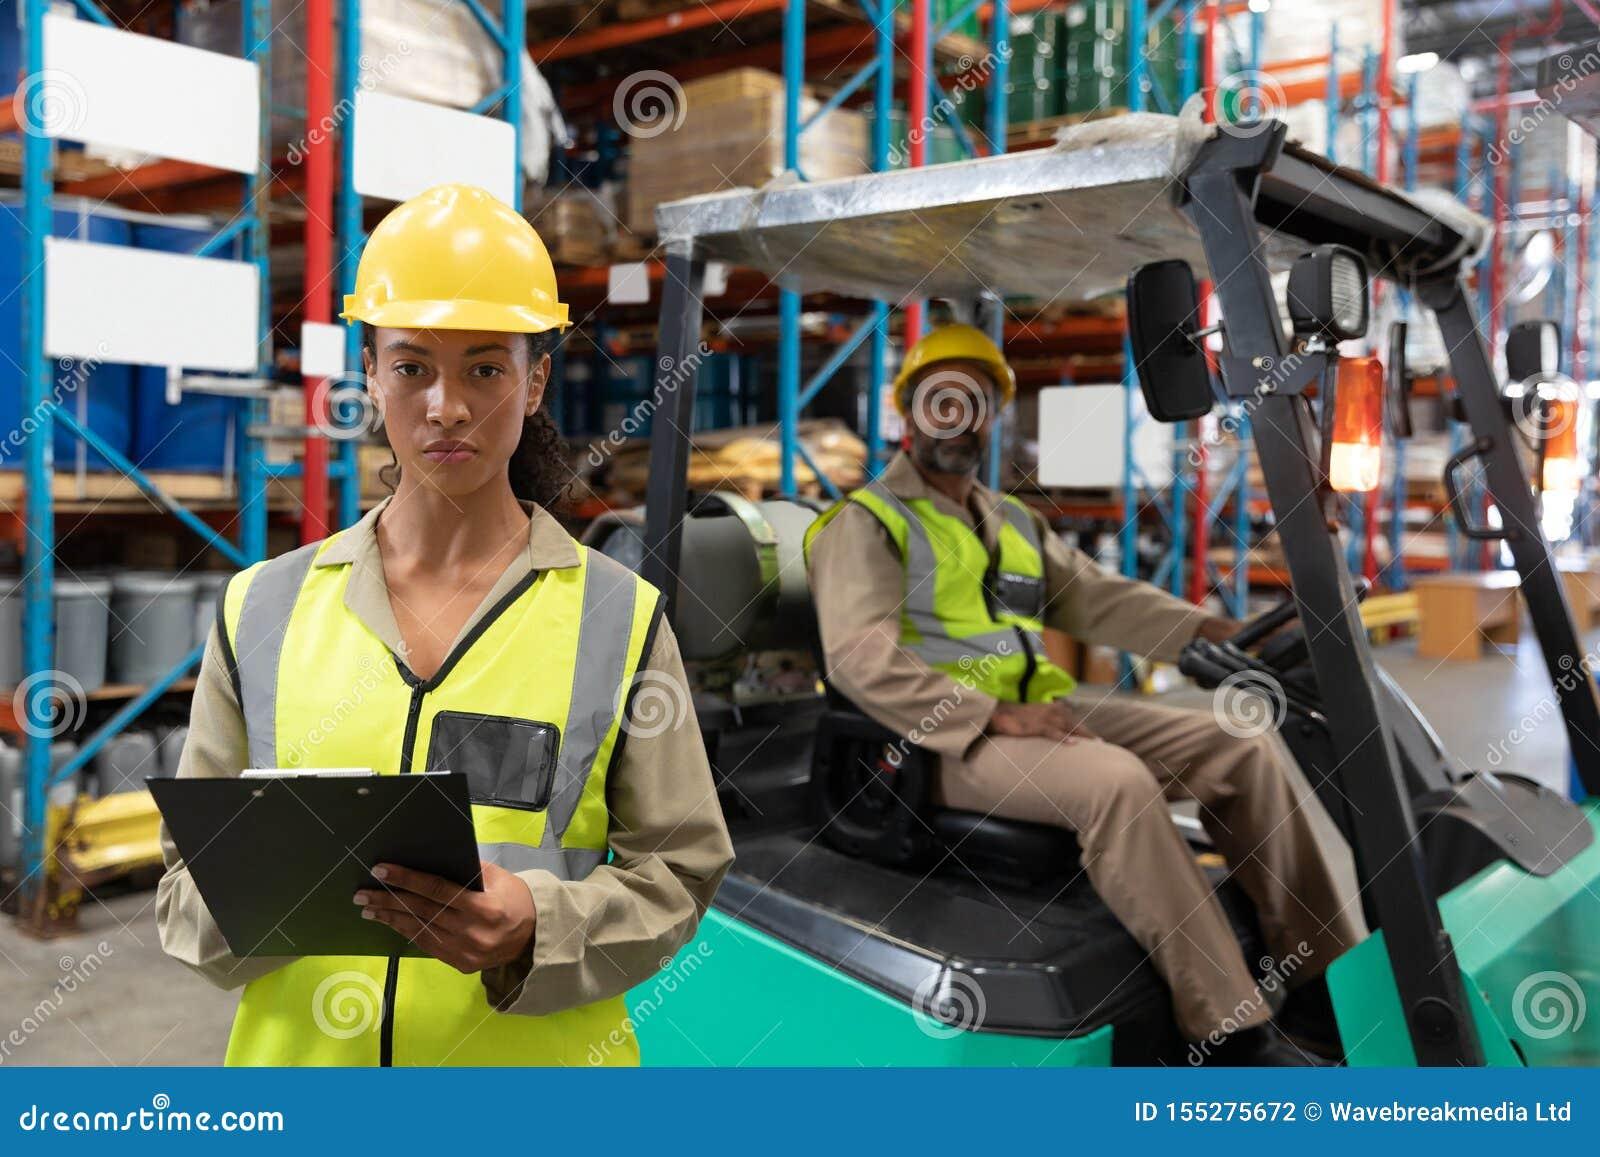 Female staff writing on clipboard in warehouse